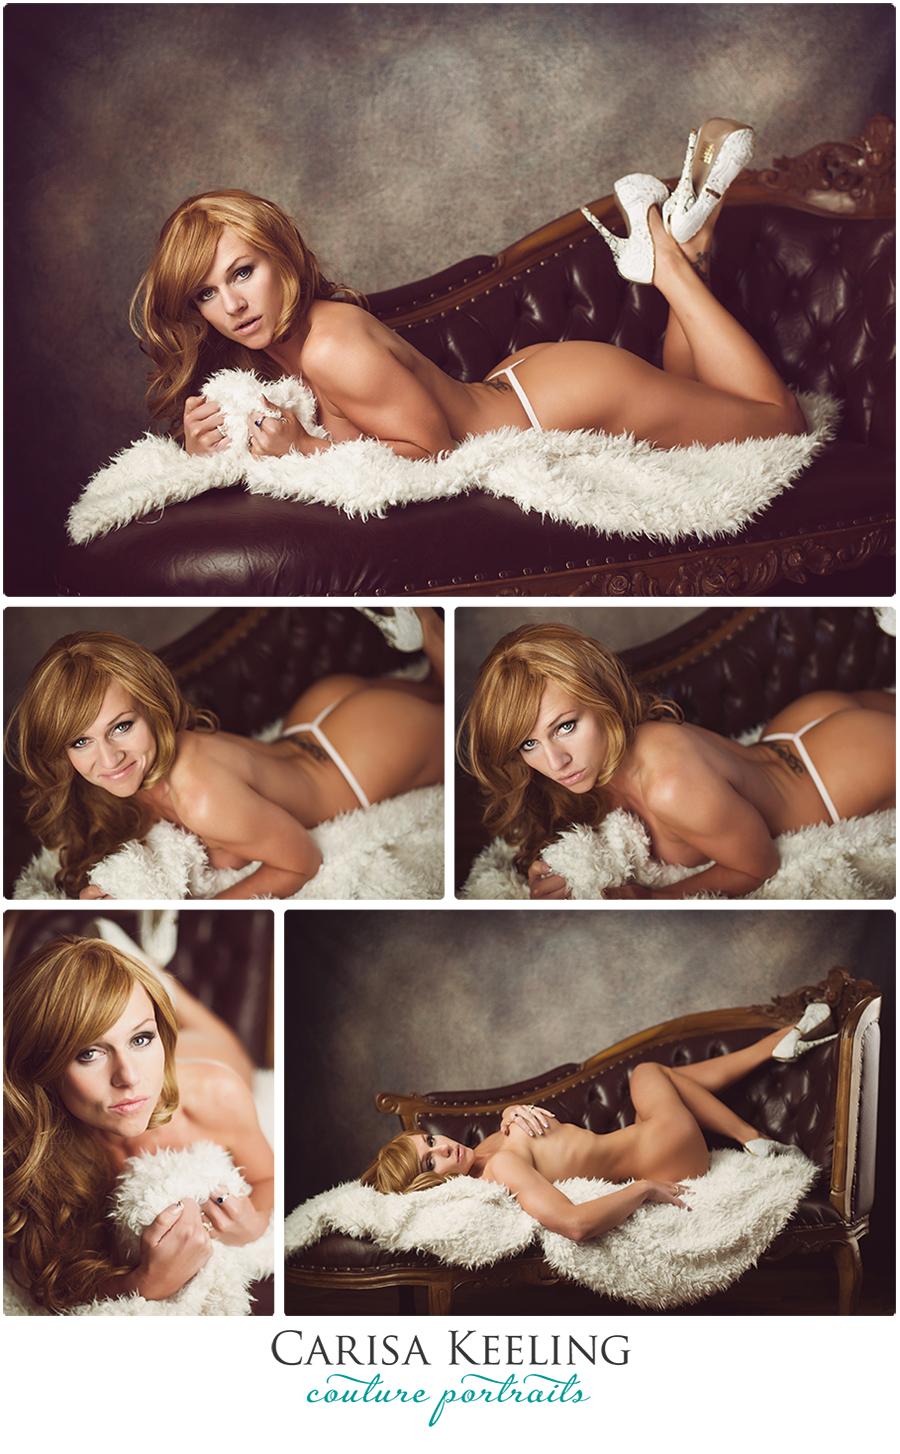 Blog-Collage-1394054258487.jpg